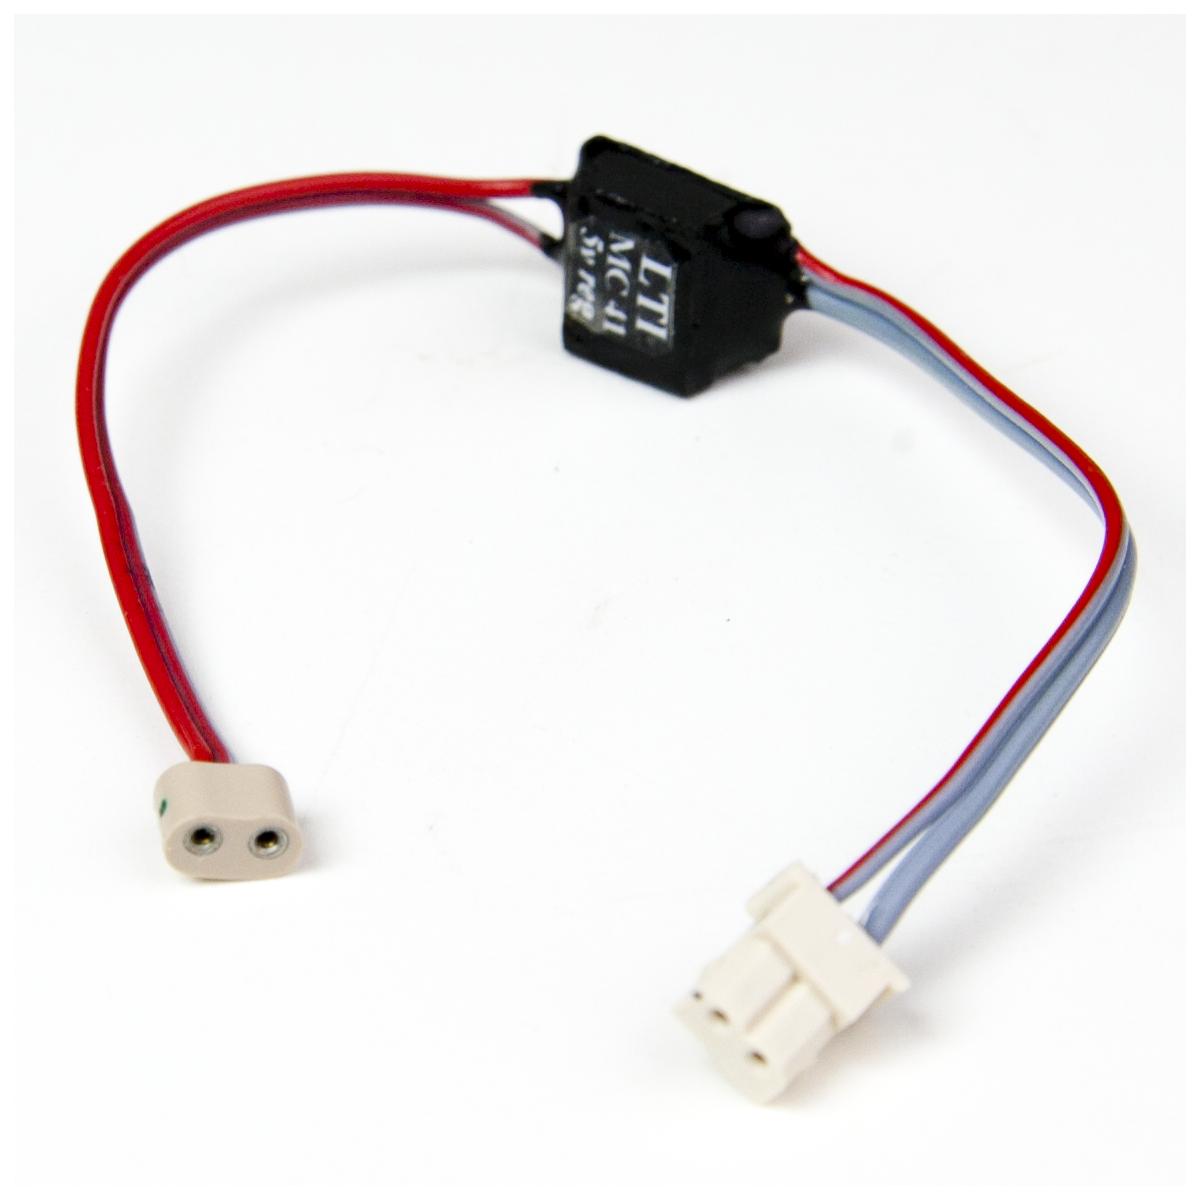 Battery Adapter, for QD Plug, 5 Volt Regulator